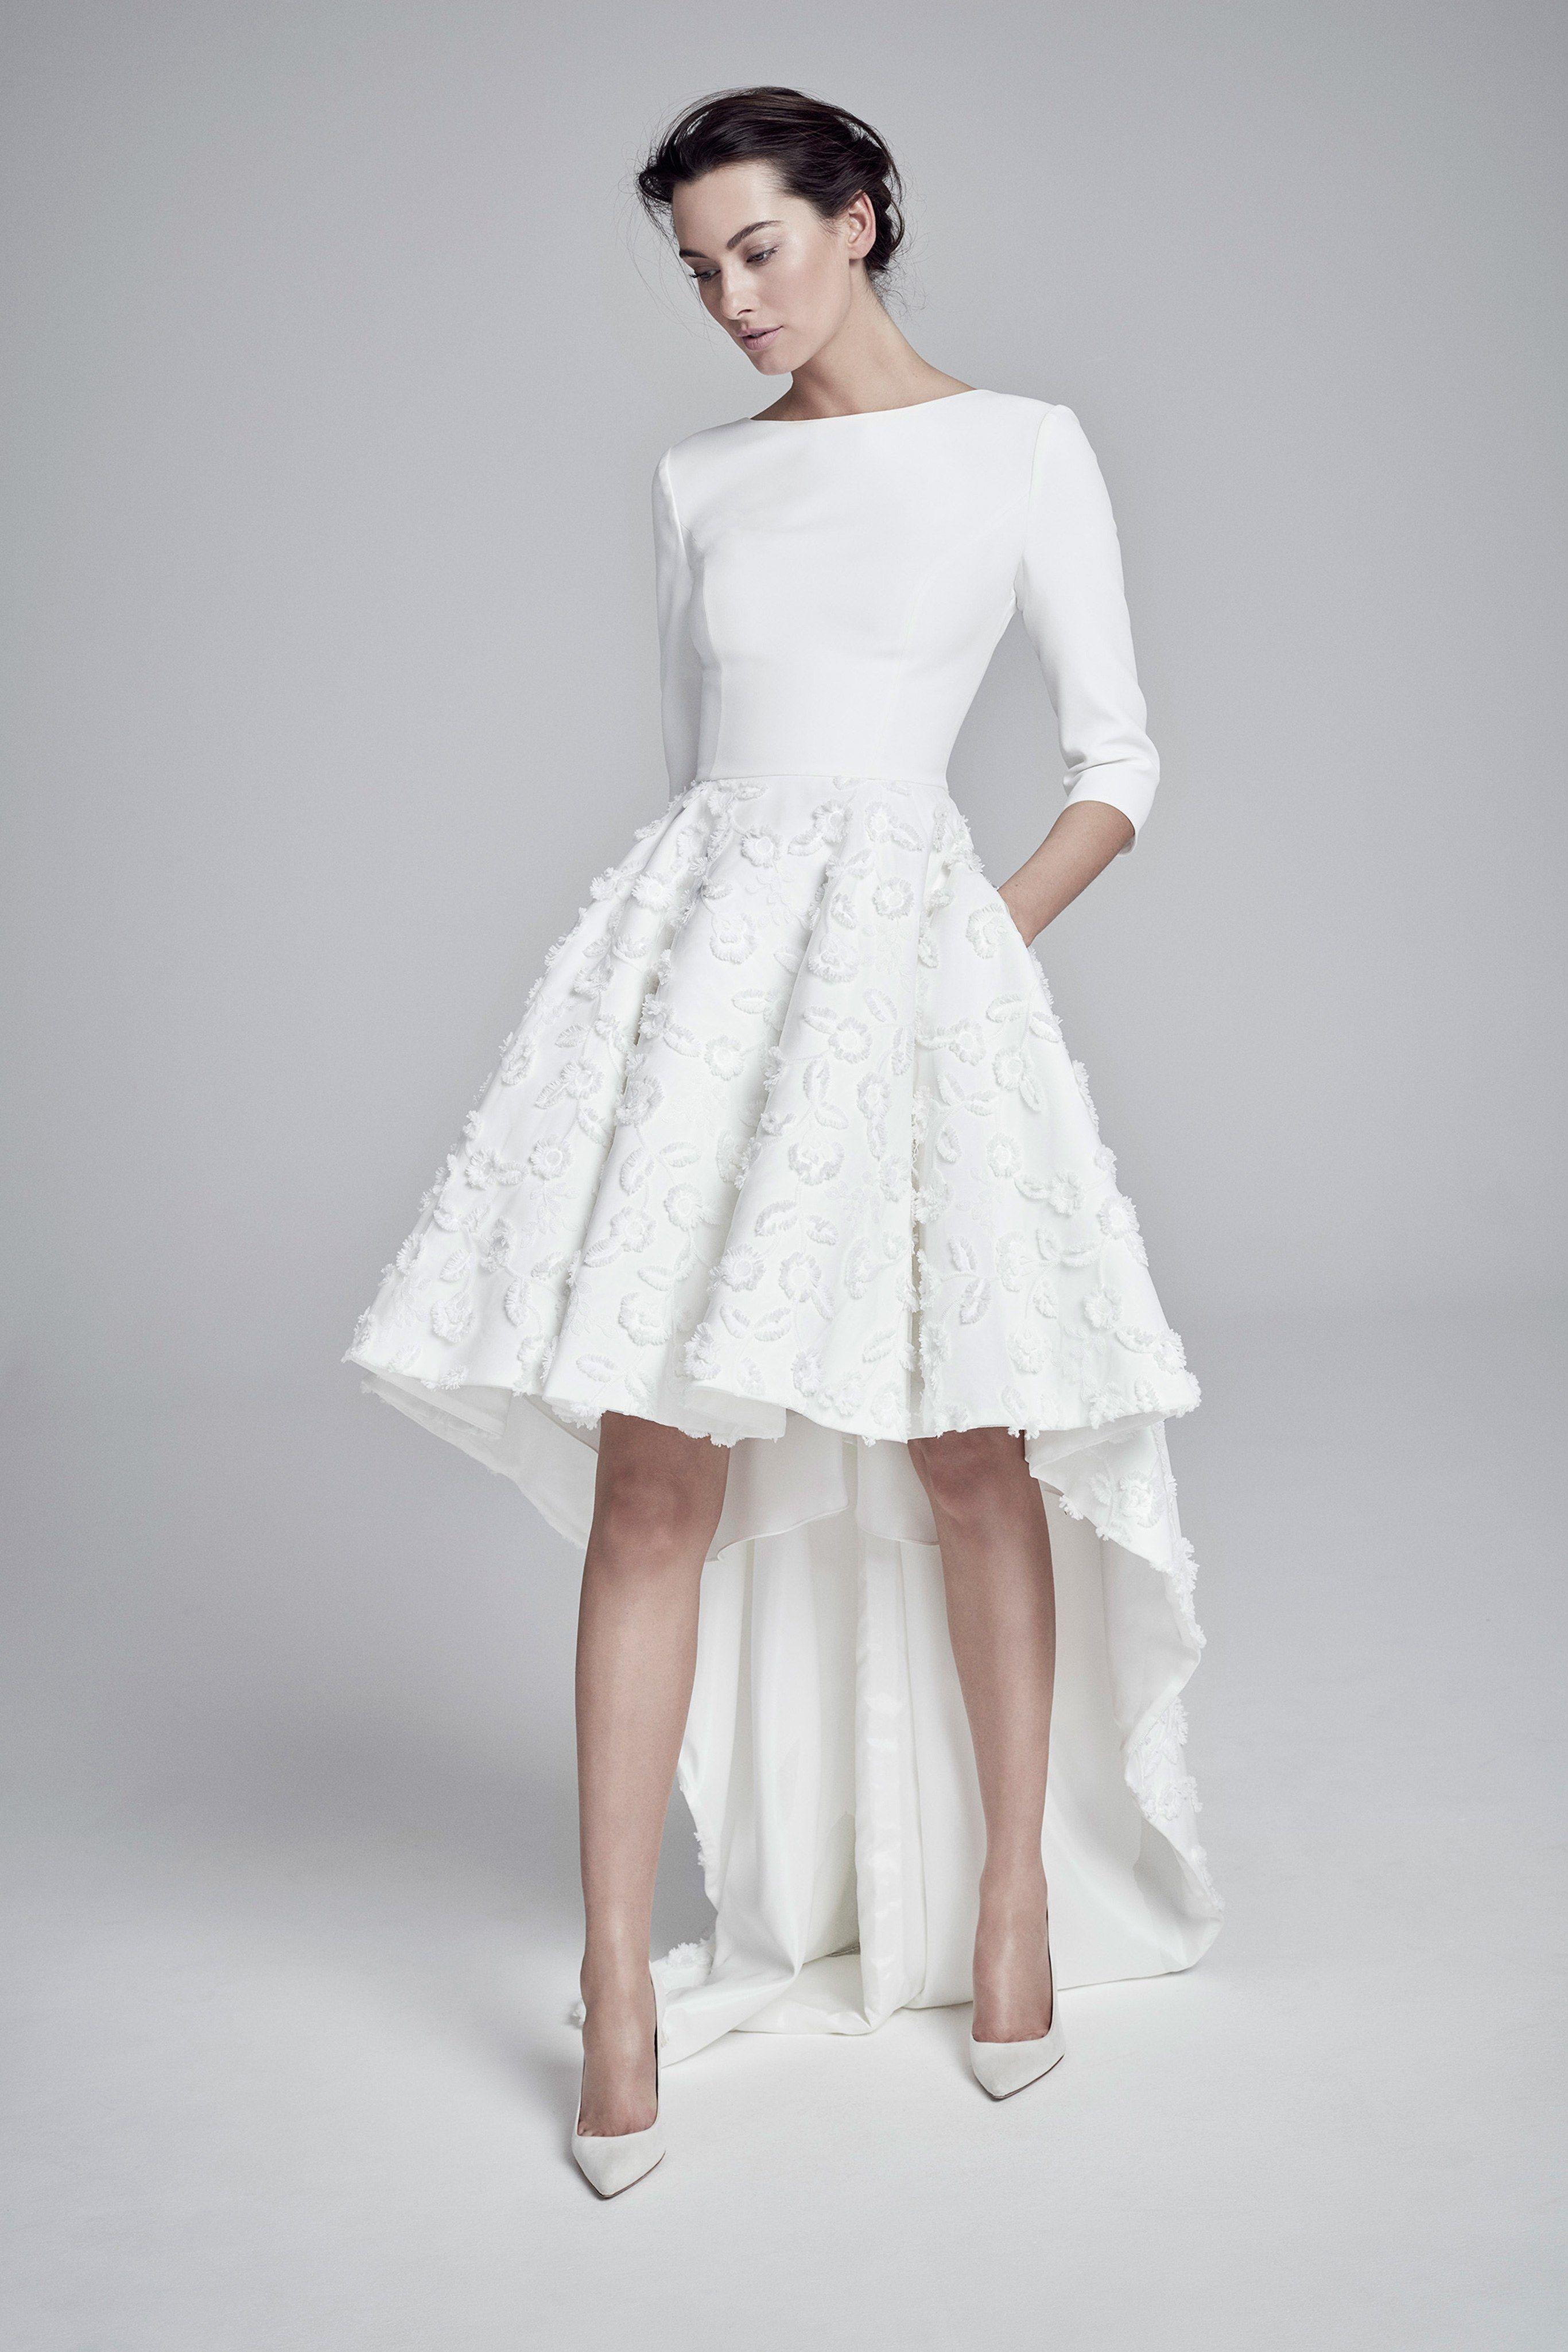 Suzanne Neville Bridal Spring 2020 Fashion Show